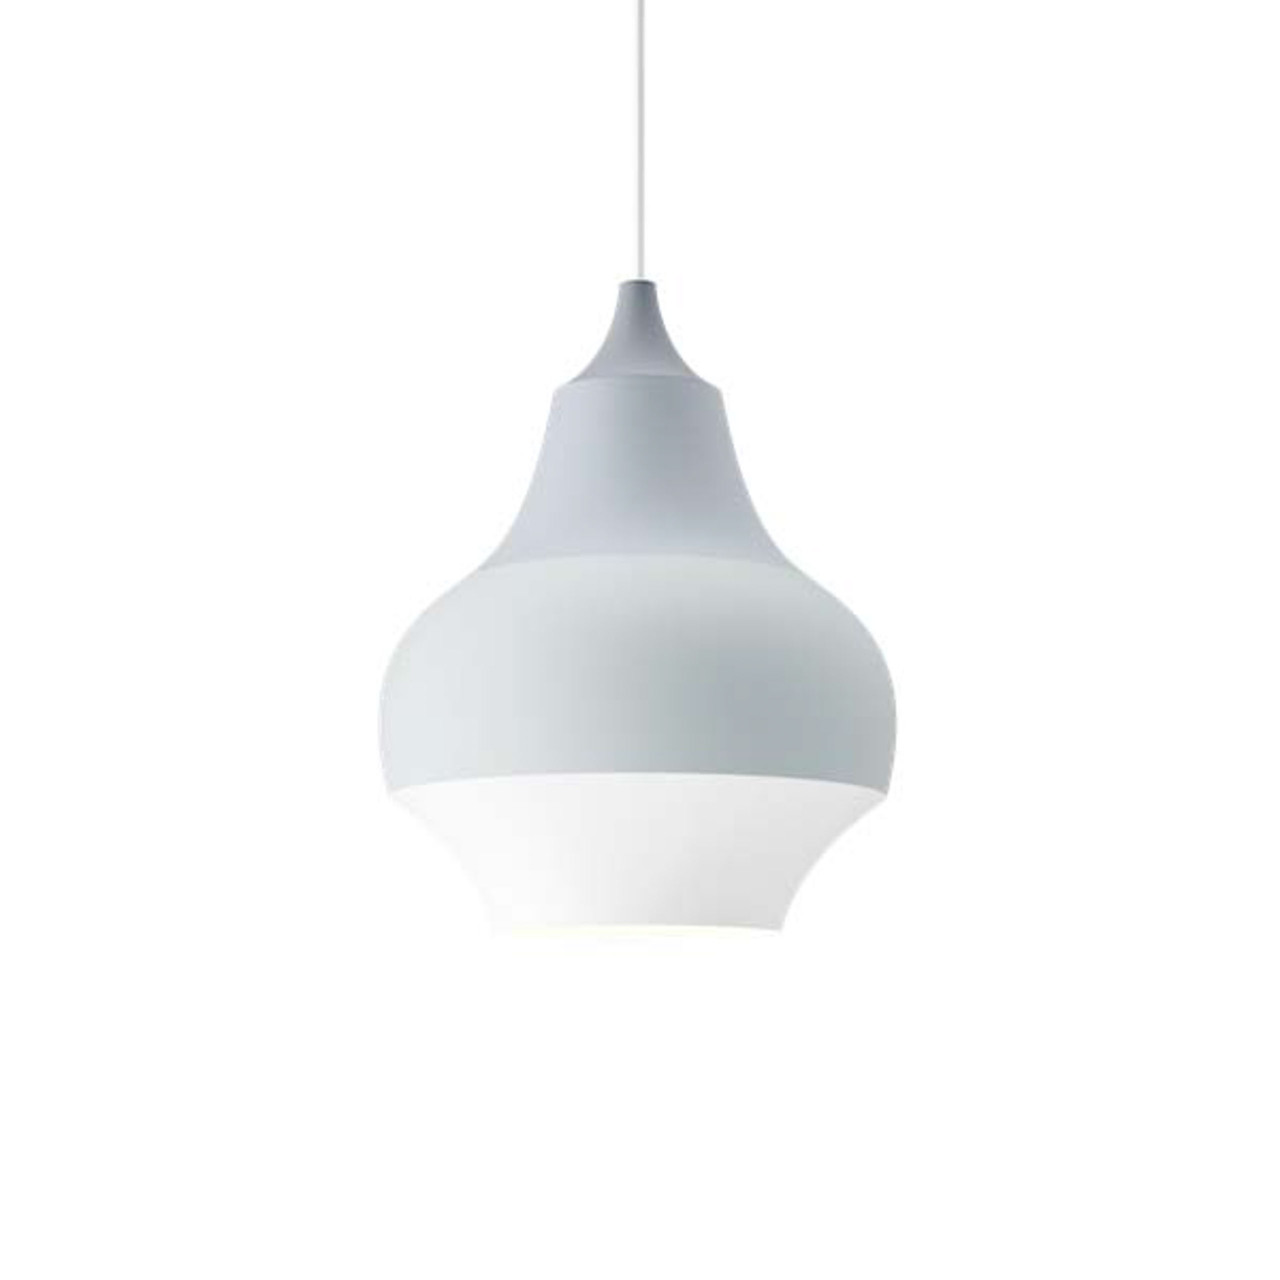 Louis Poulsen Lampe 'Cirque' Ø: 15 cm, Grau